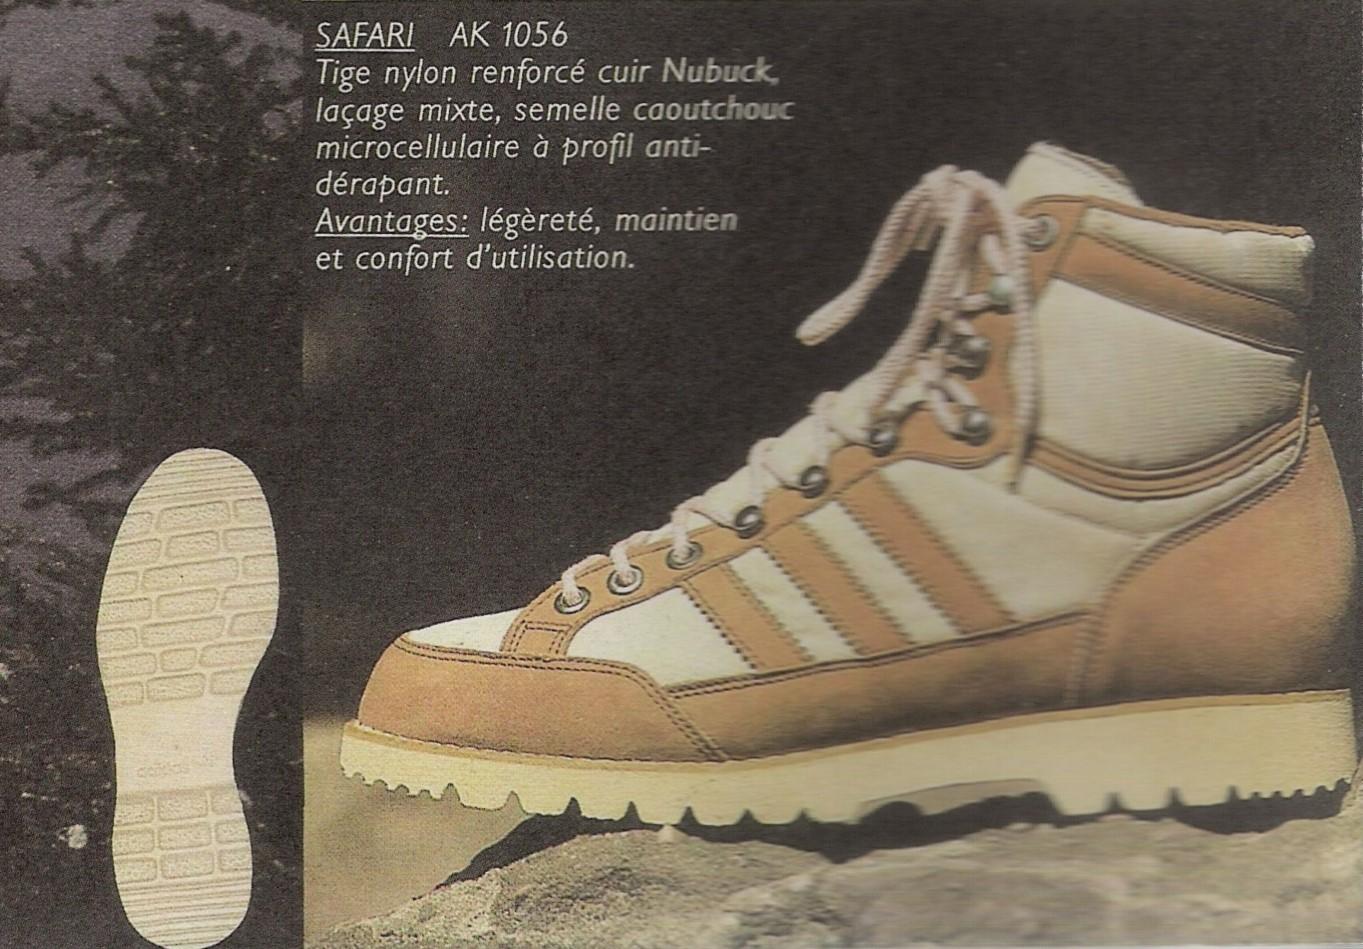 Adidas Parachuting Shoes